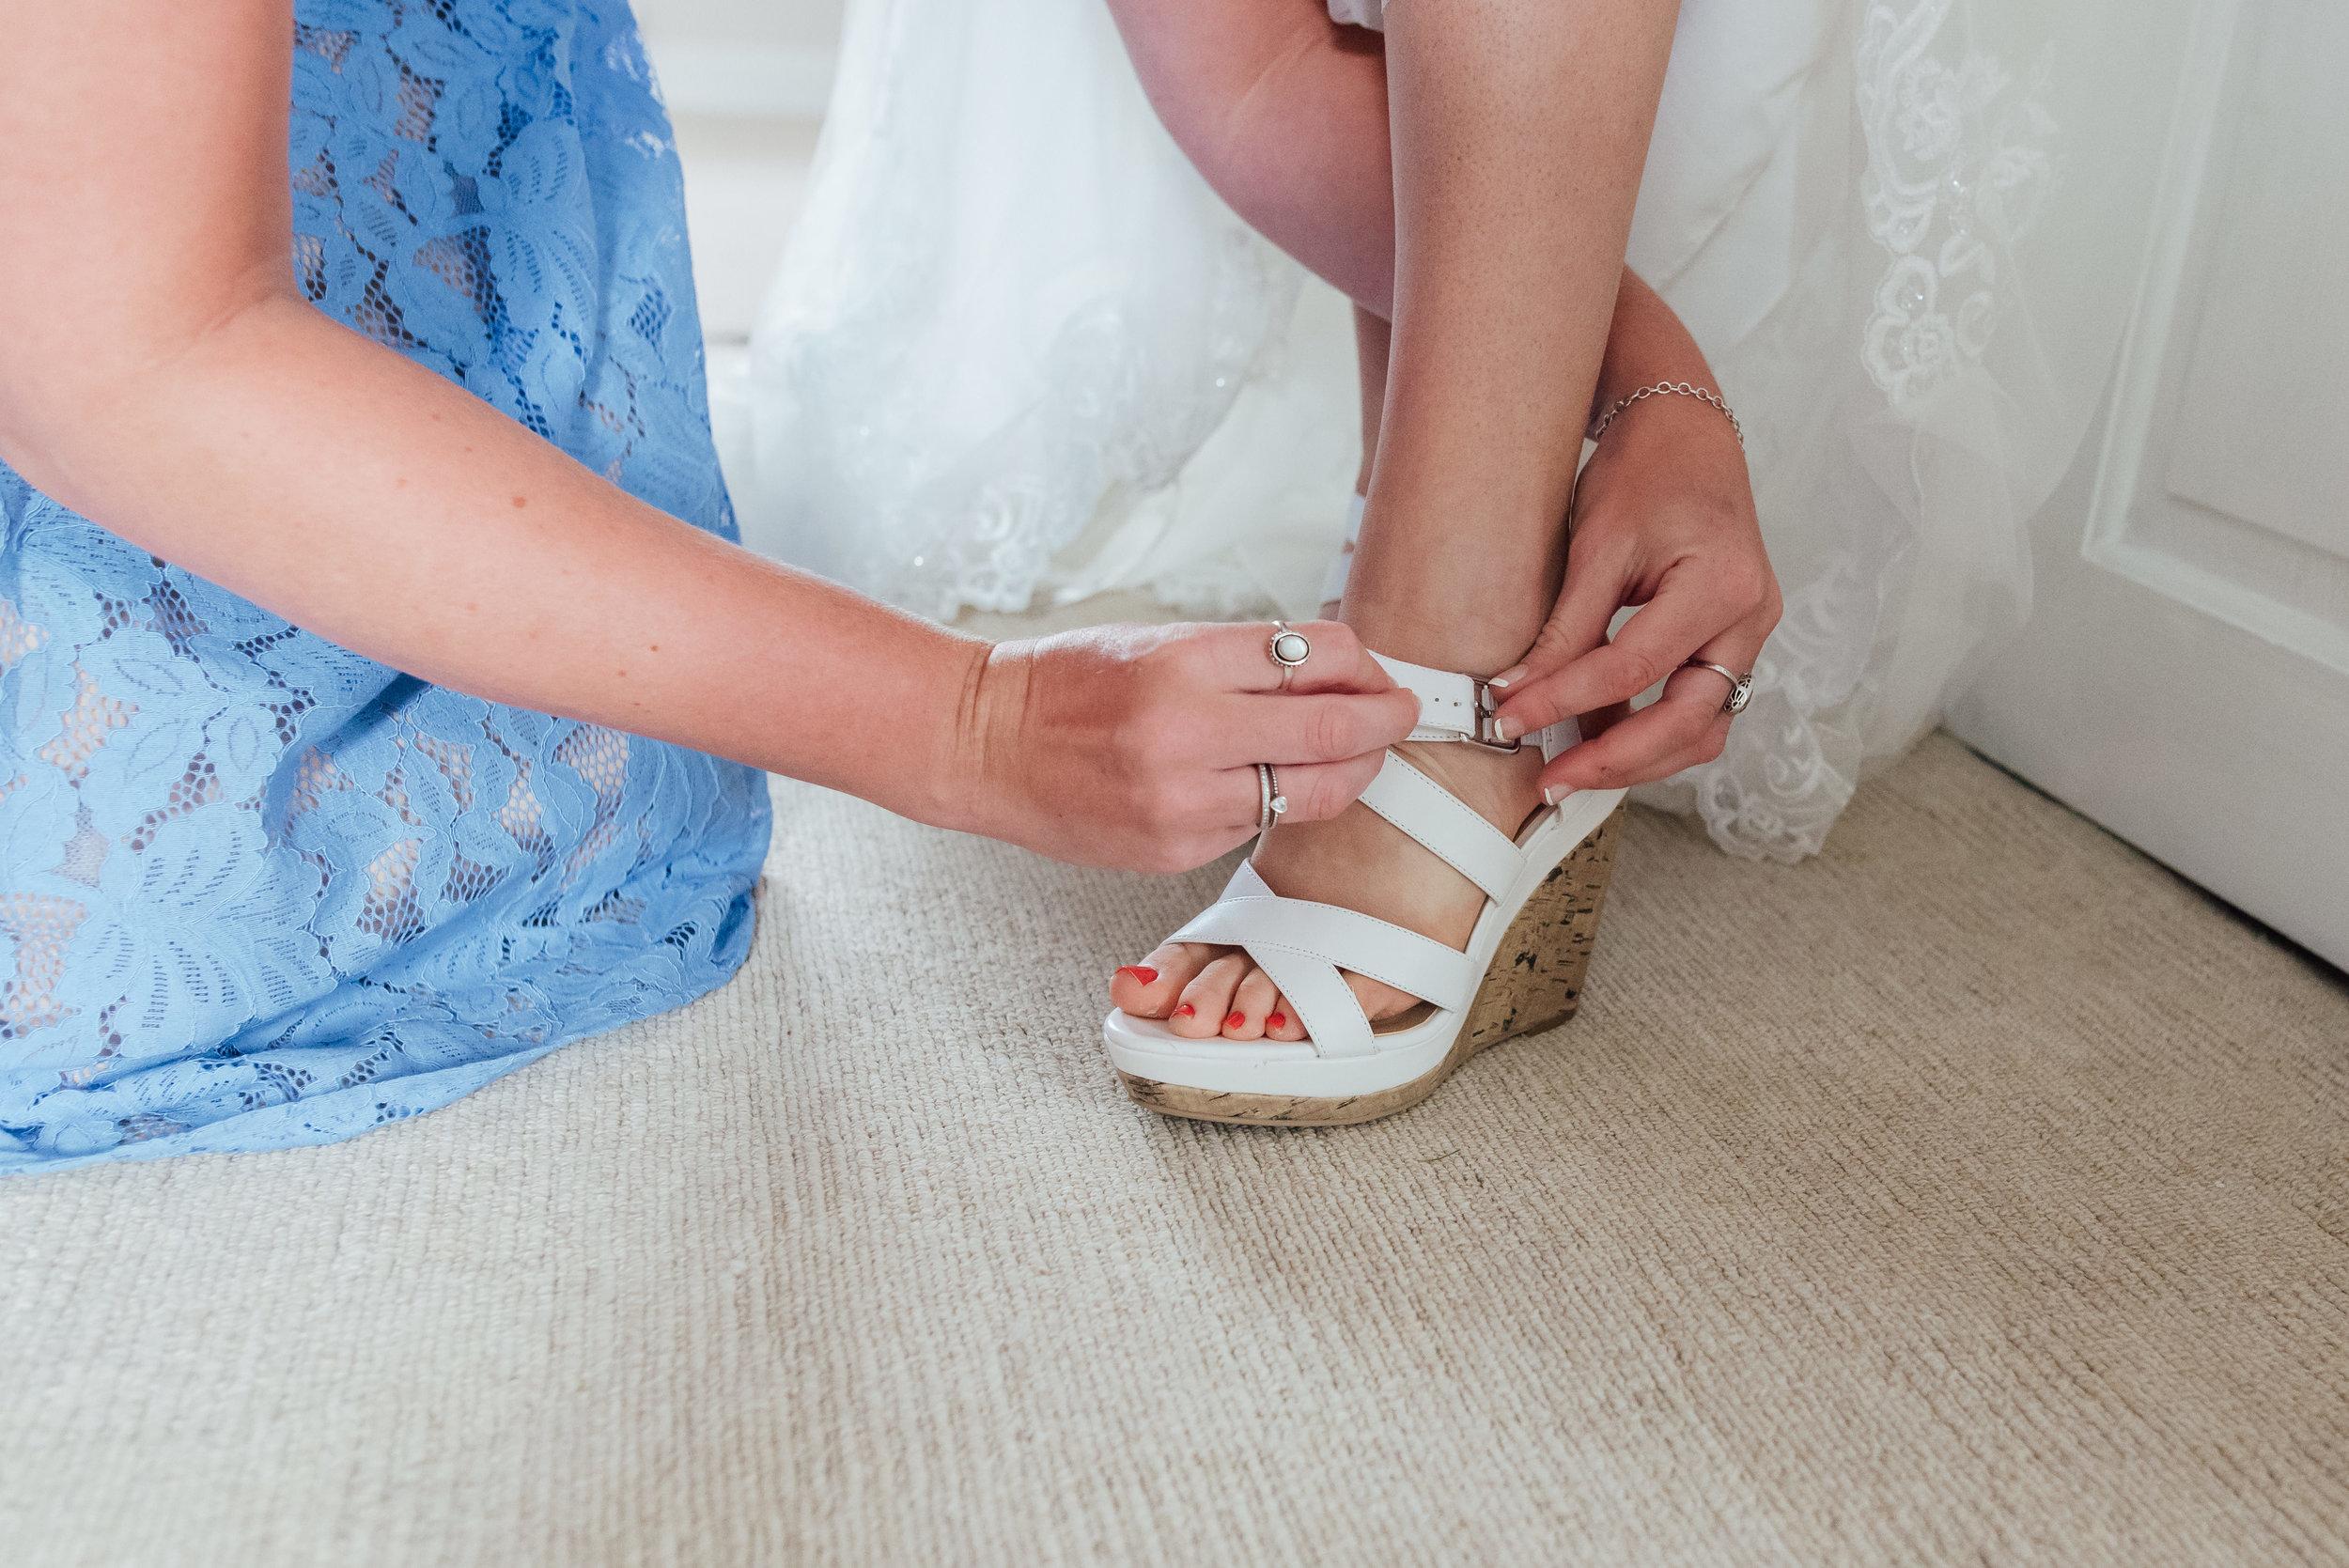 hampshire-wedding-photographer / Amy-james-photography / Hampshire-village-hall-wedding / village-hall-wedding / wedding-photographer-hampshire-surrey-berkshire / rotherwick-village-hall-wedding / Fleet -wedding-photographer / bridesmaid-doing-up-brides-shoe